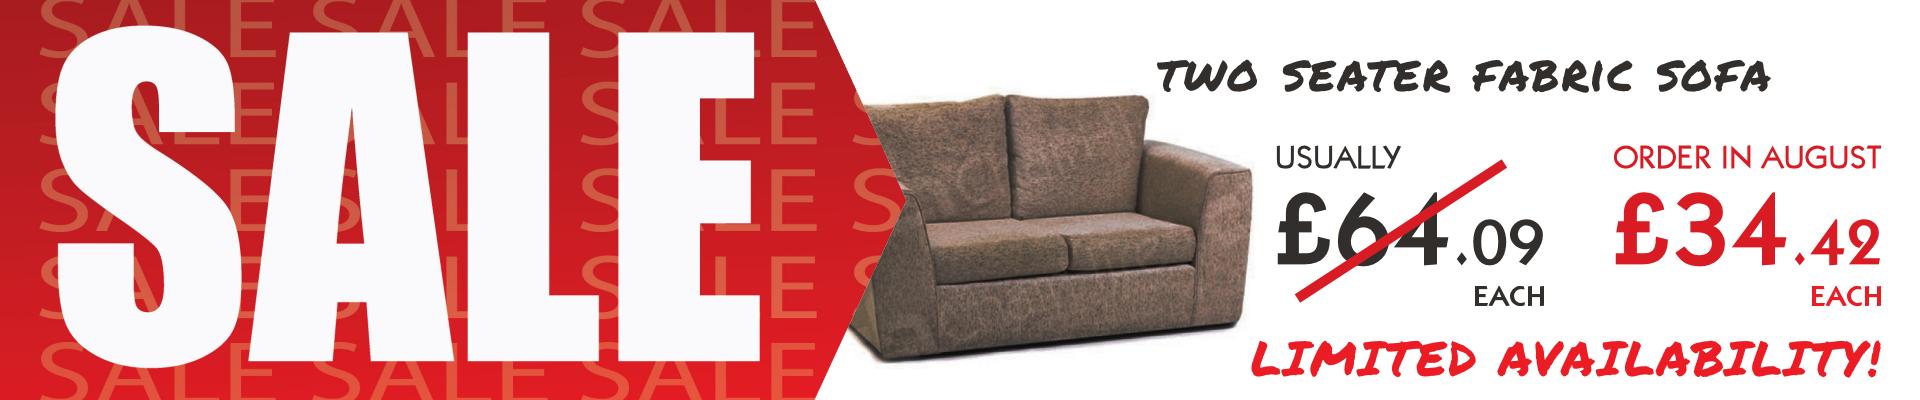 Two Seater Fabric Sofa Sale